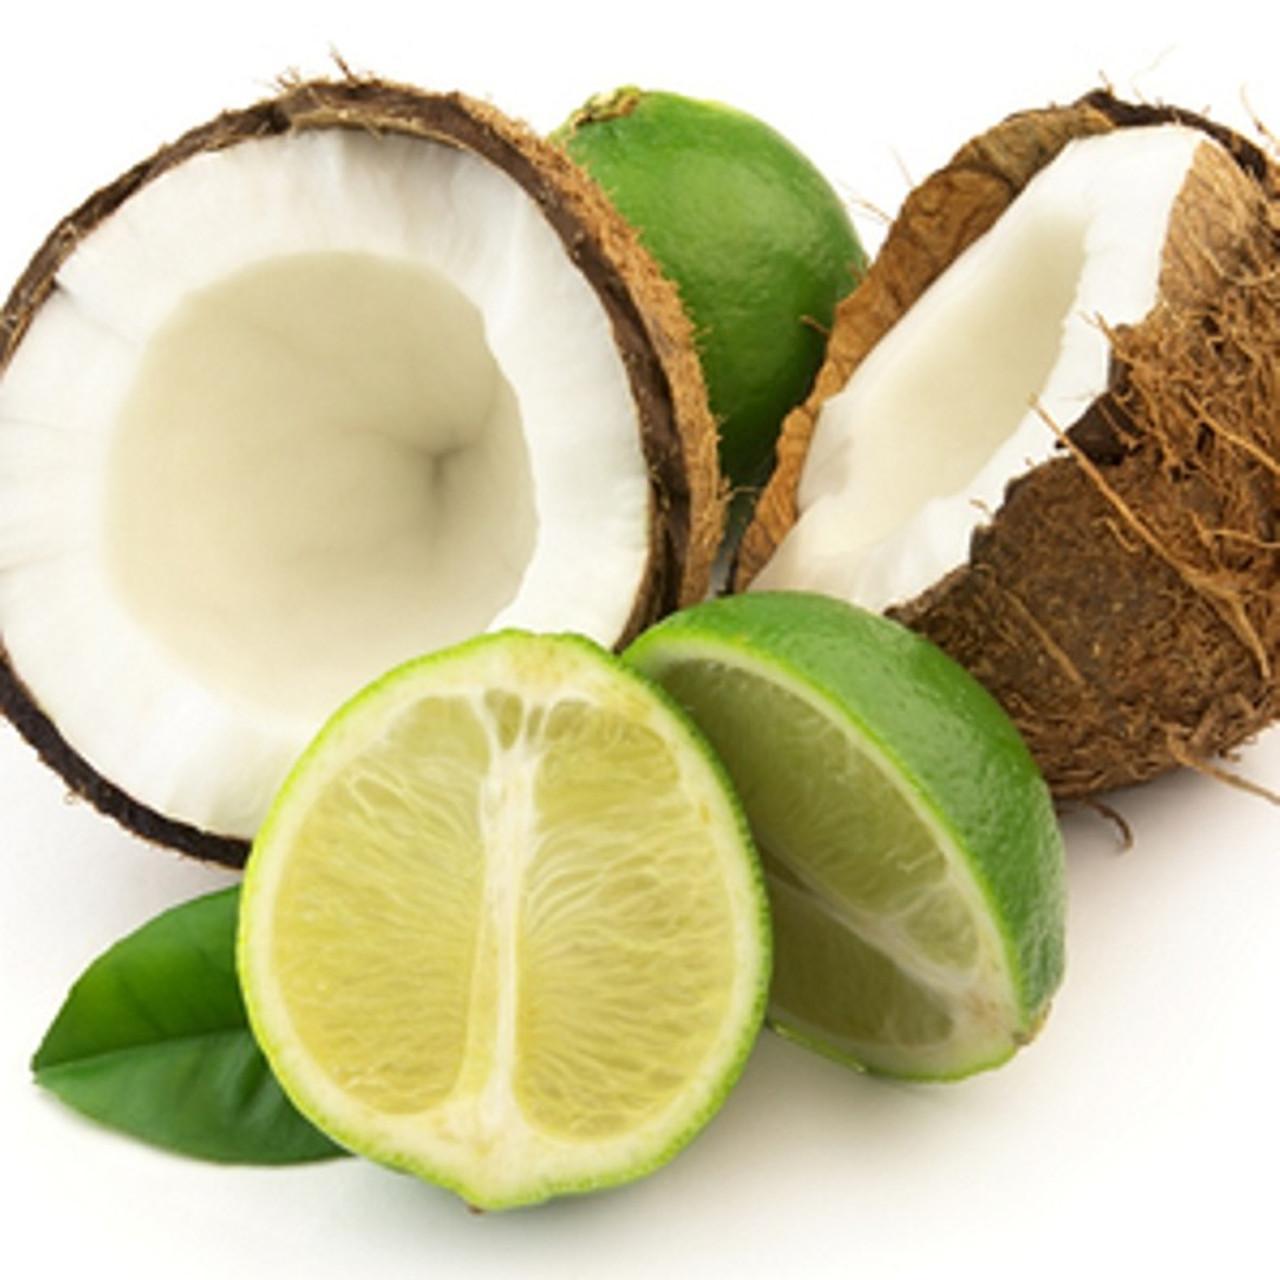 coconut fragrance Coconut Lime Verbena type scent for candle coconut candle scent candle Coconut scent